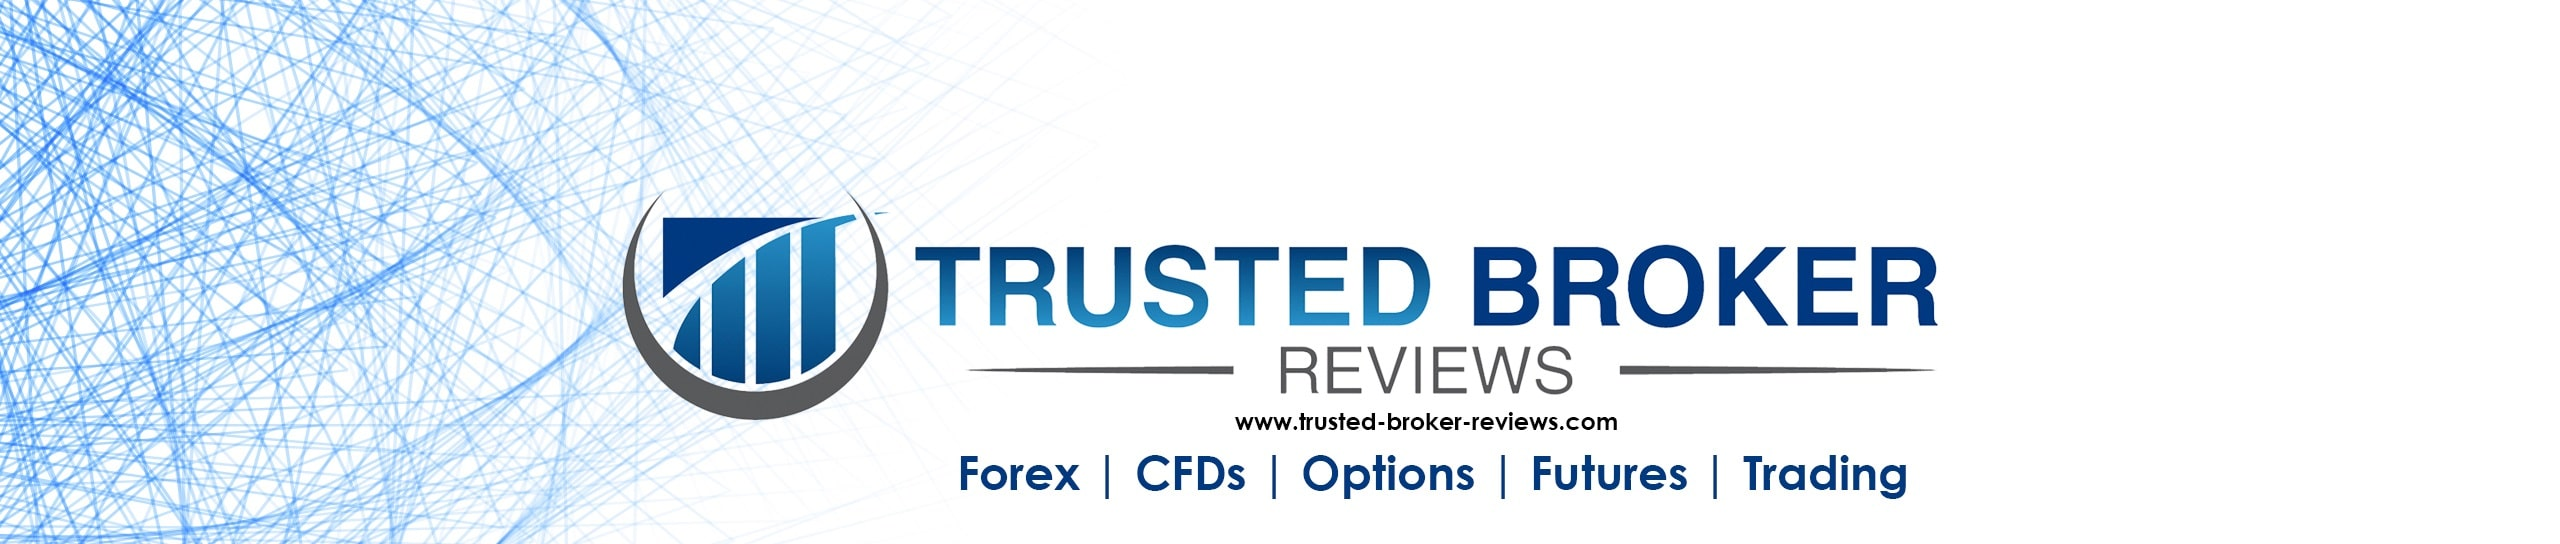 Trusted Broker opinie o nas logo